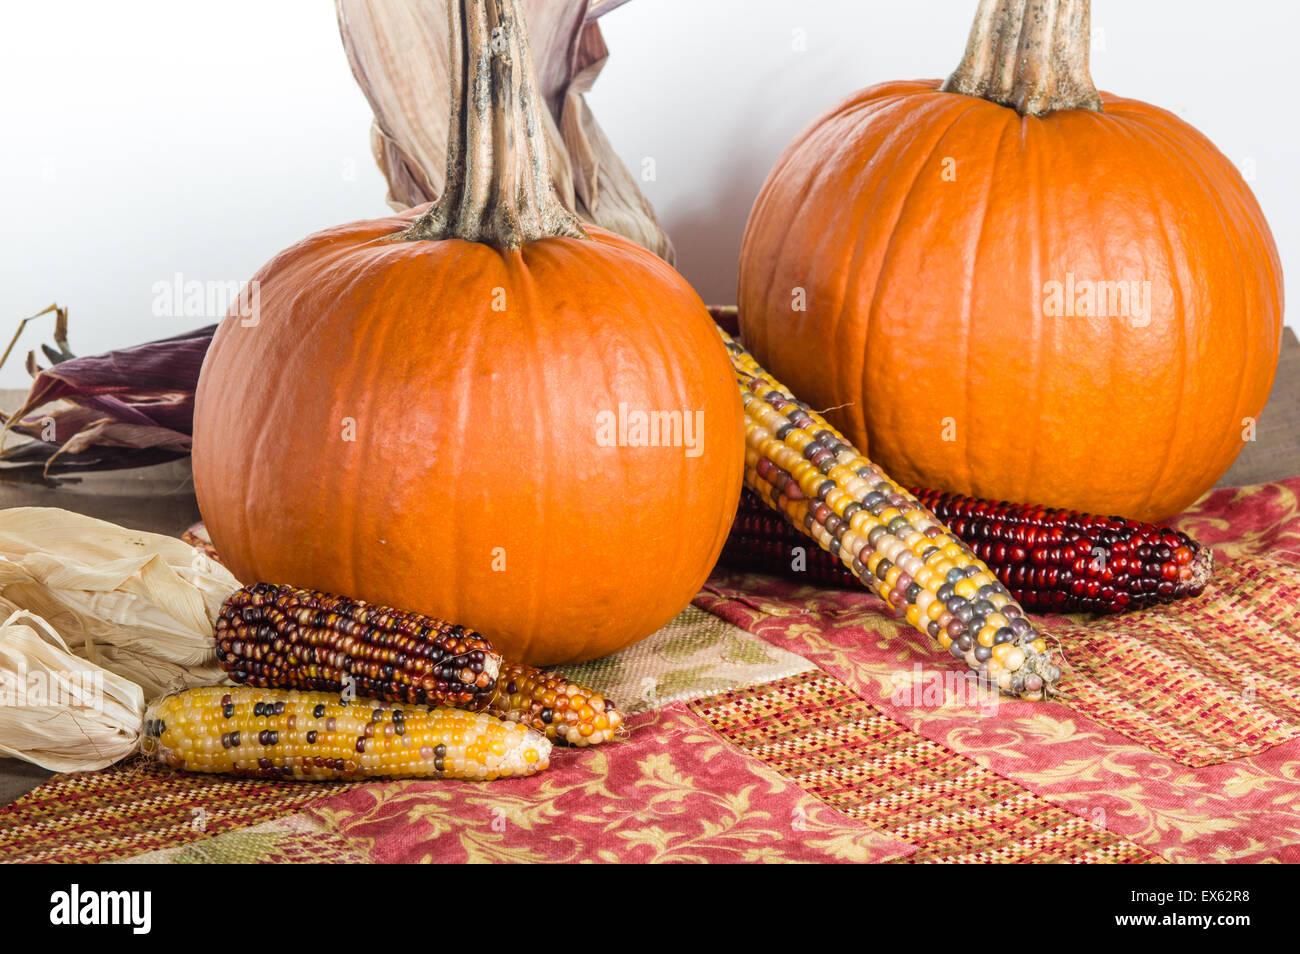 Orange pumpkin display with colorful ears of corn - Stock Image